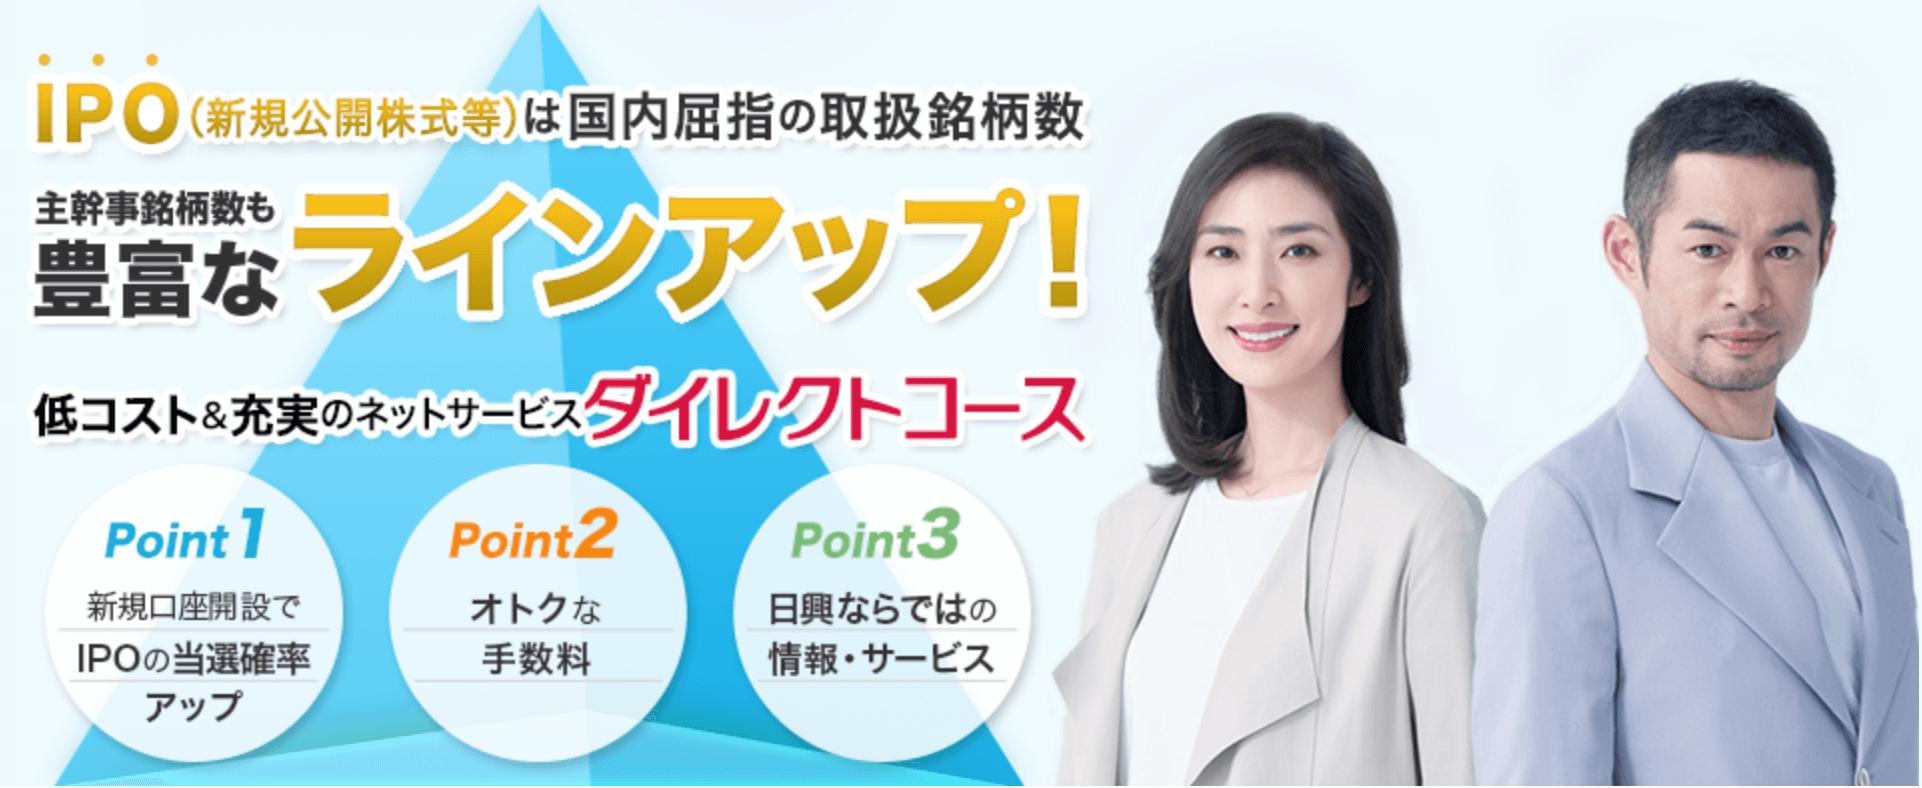 SMBC日興証券の強みやイージートレード・評判について徹底解説!